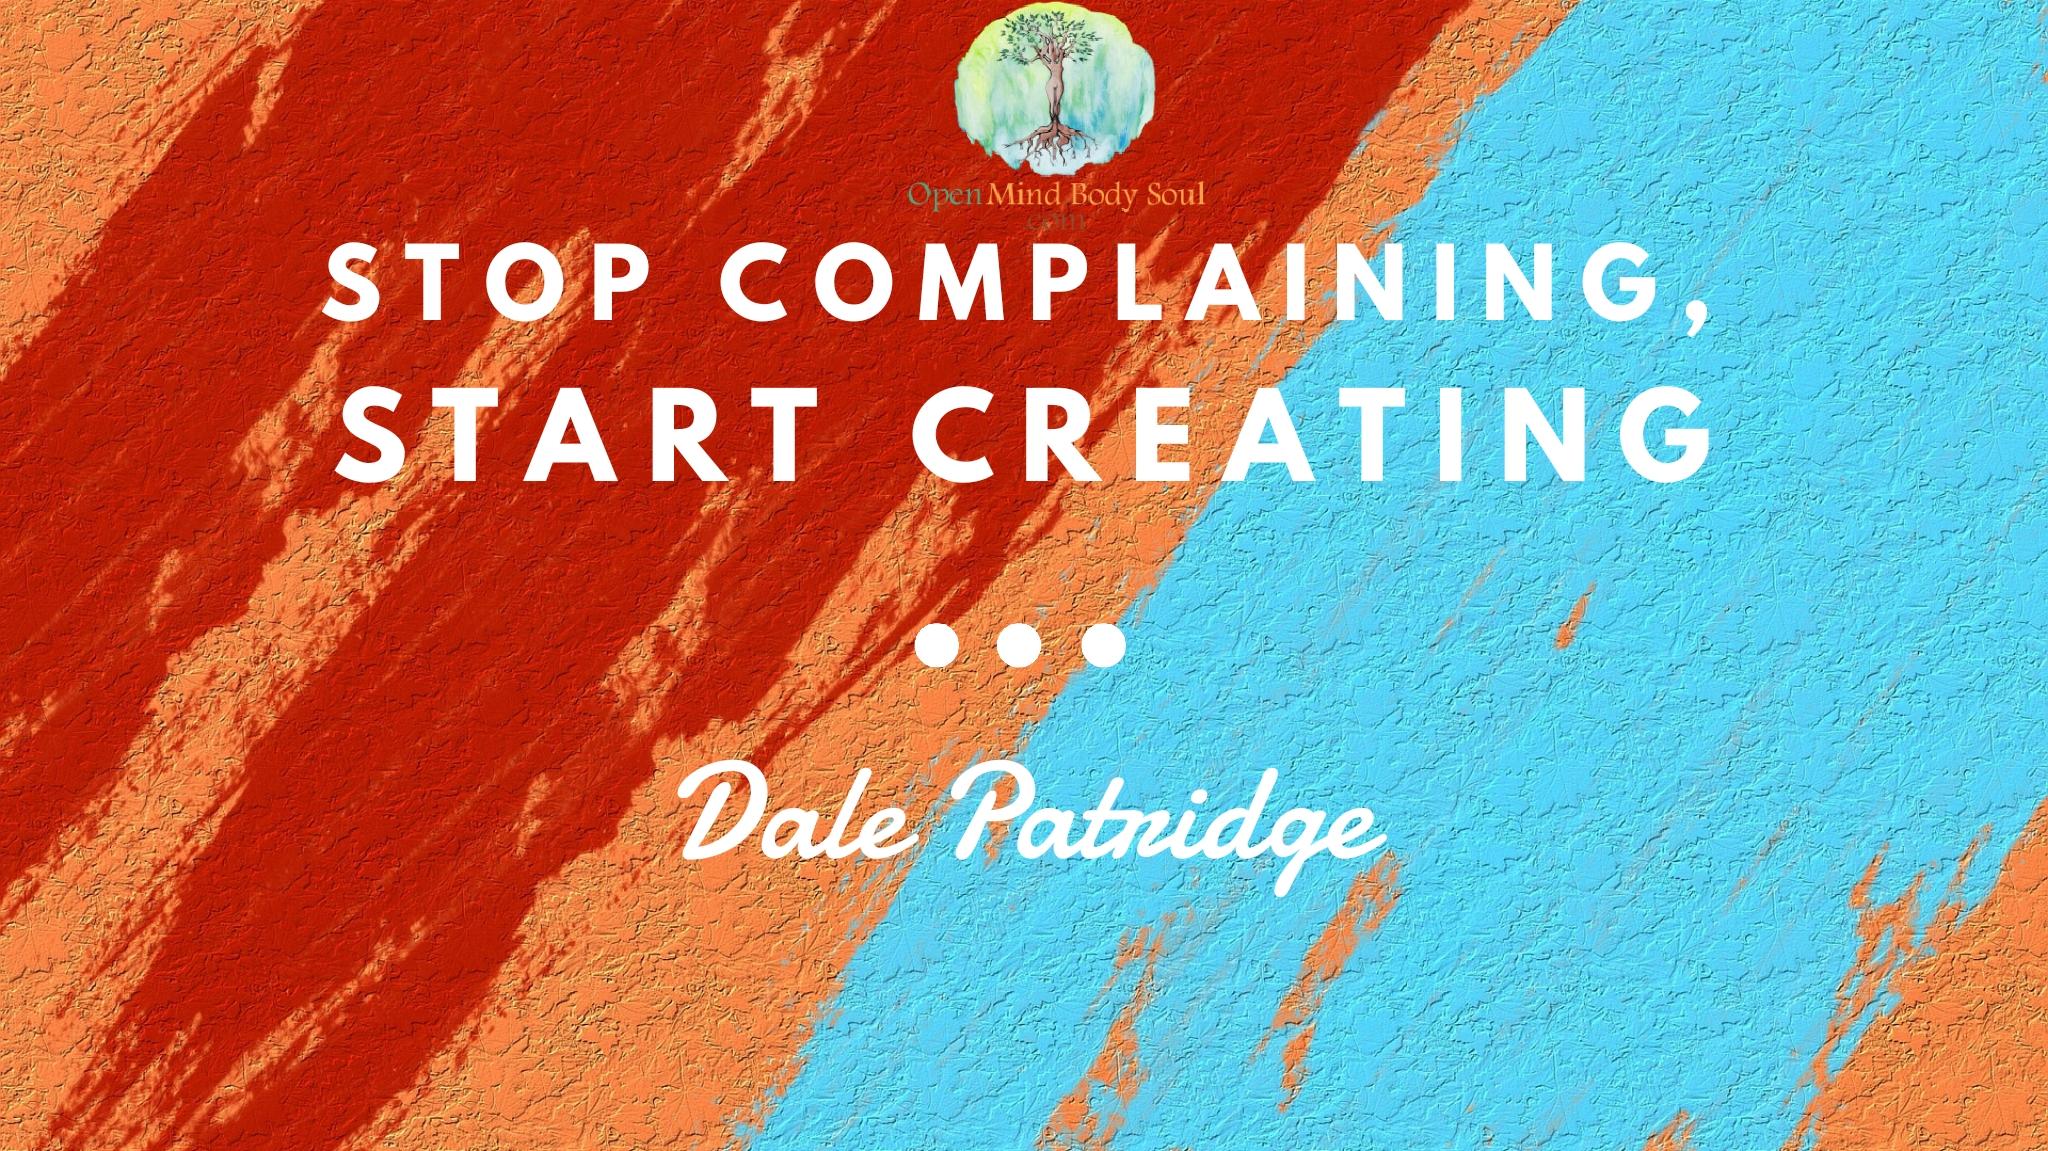 stop-complaining-start-creating-quote-dale-patridge